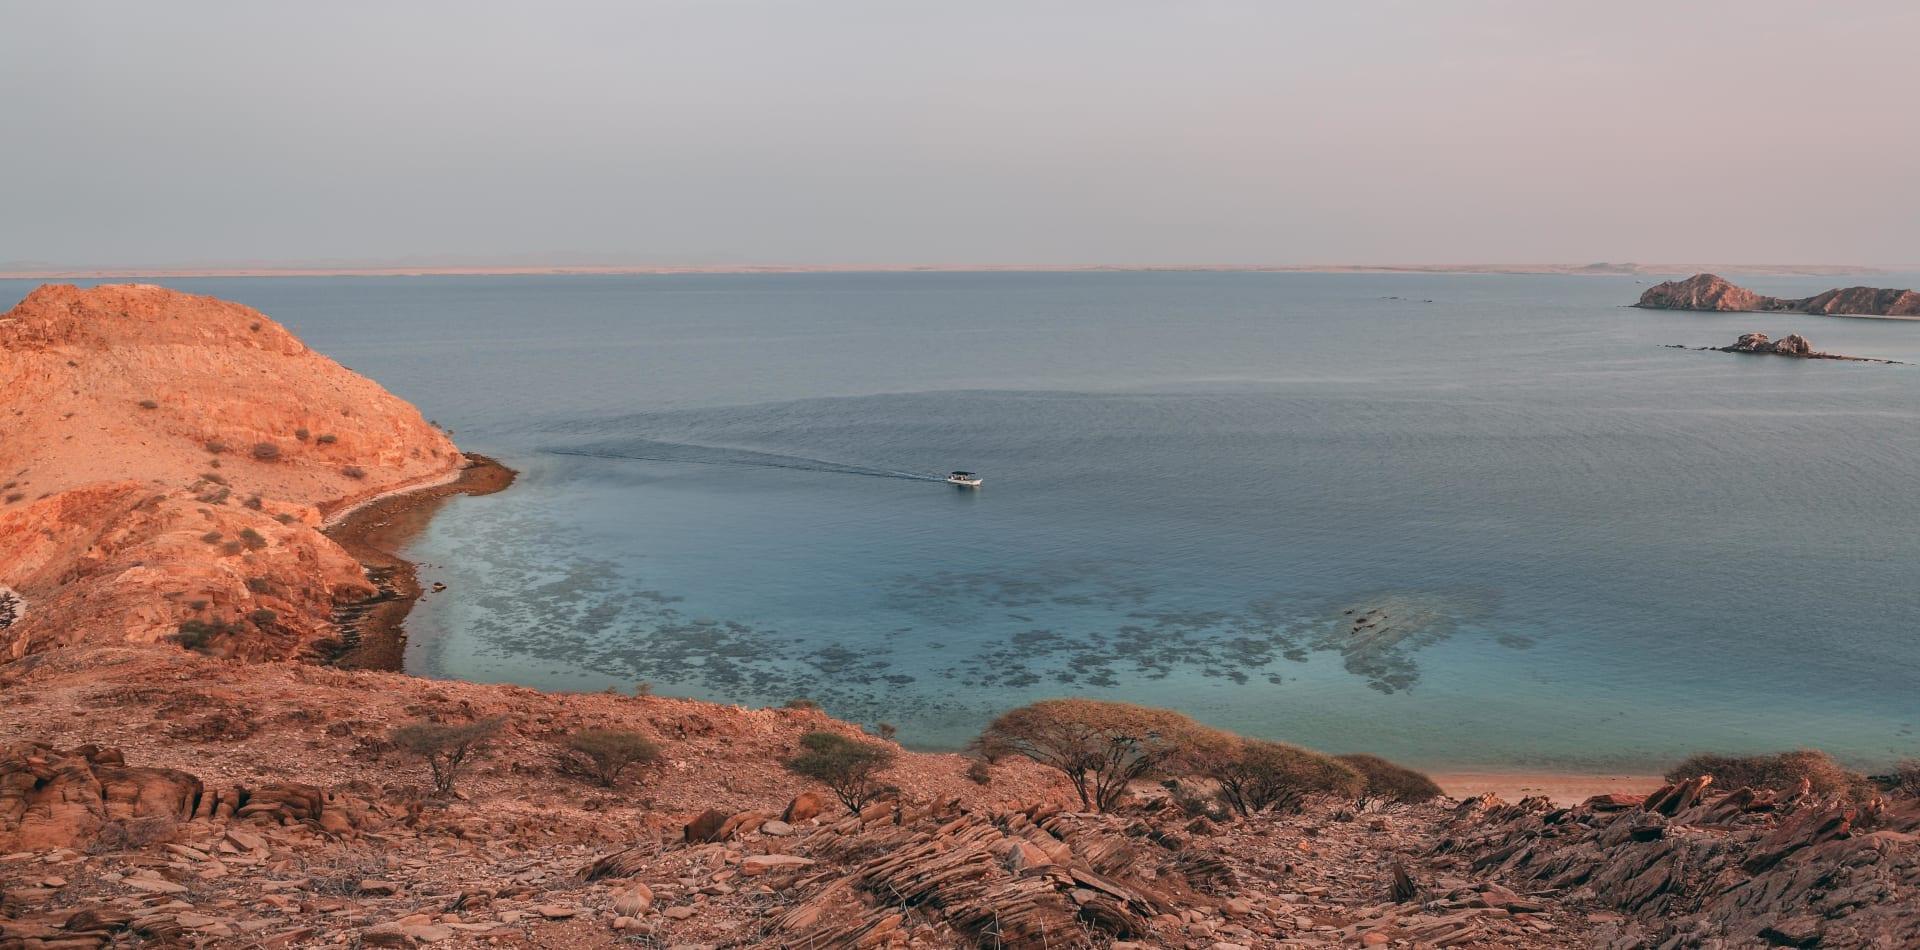 Coastline in Eritrea